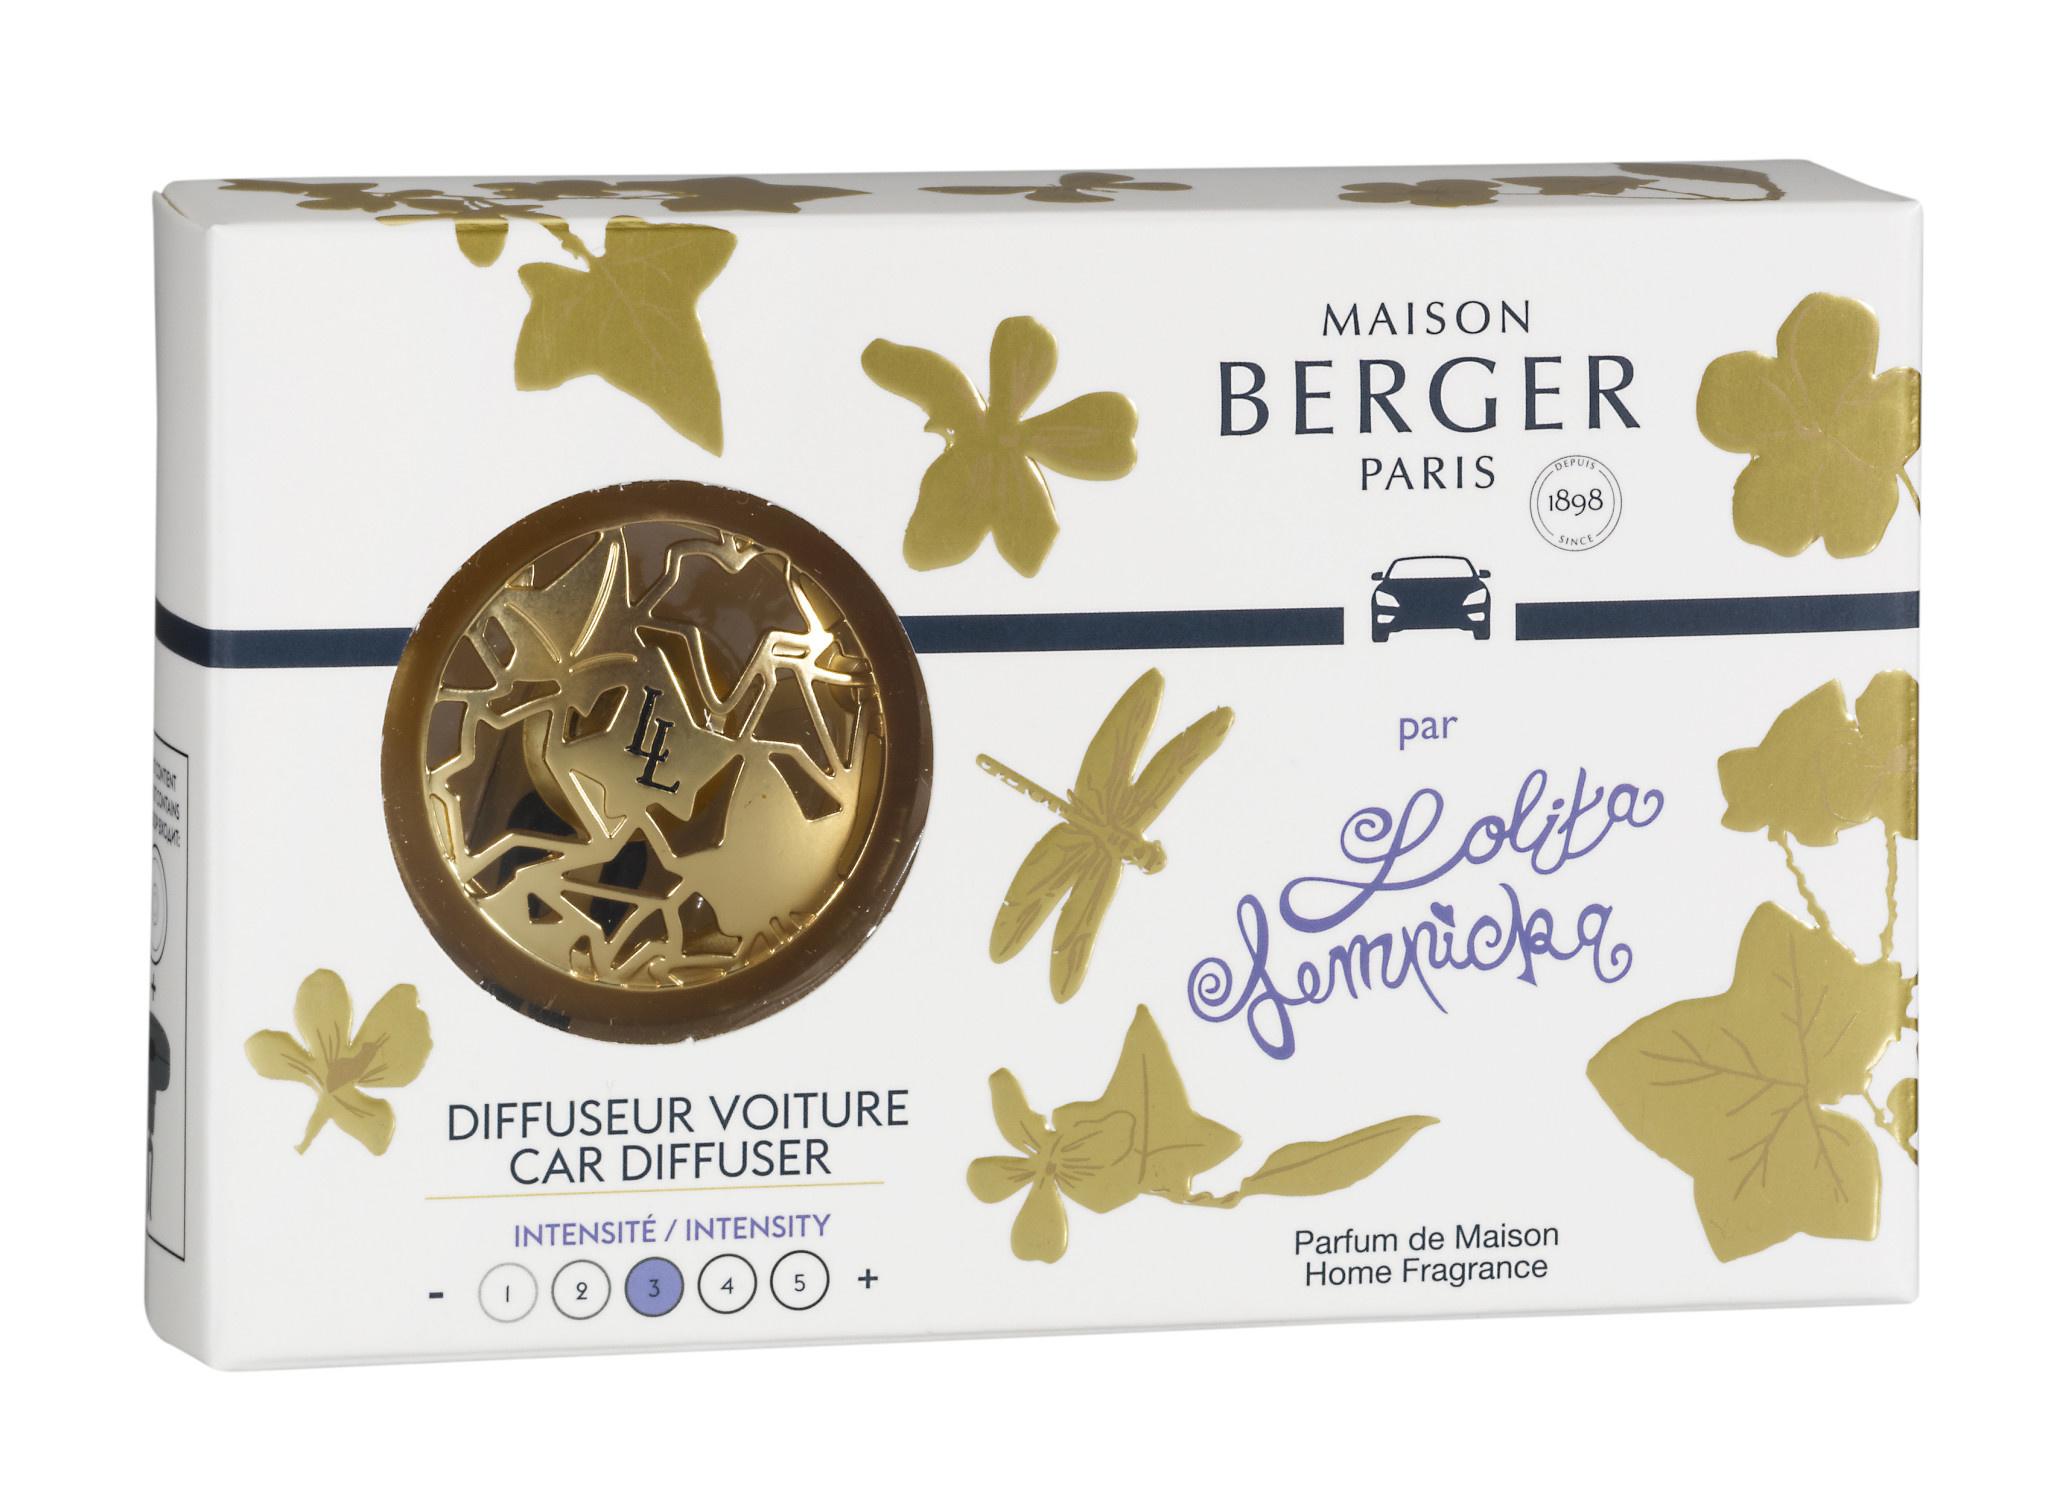 Maison Berger Lolita Lempicka Autodiffuser Or Satiné + 1 Navulling